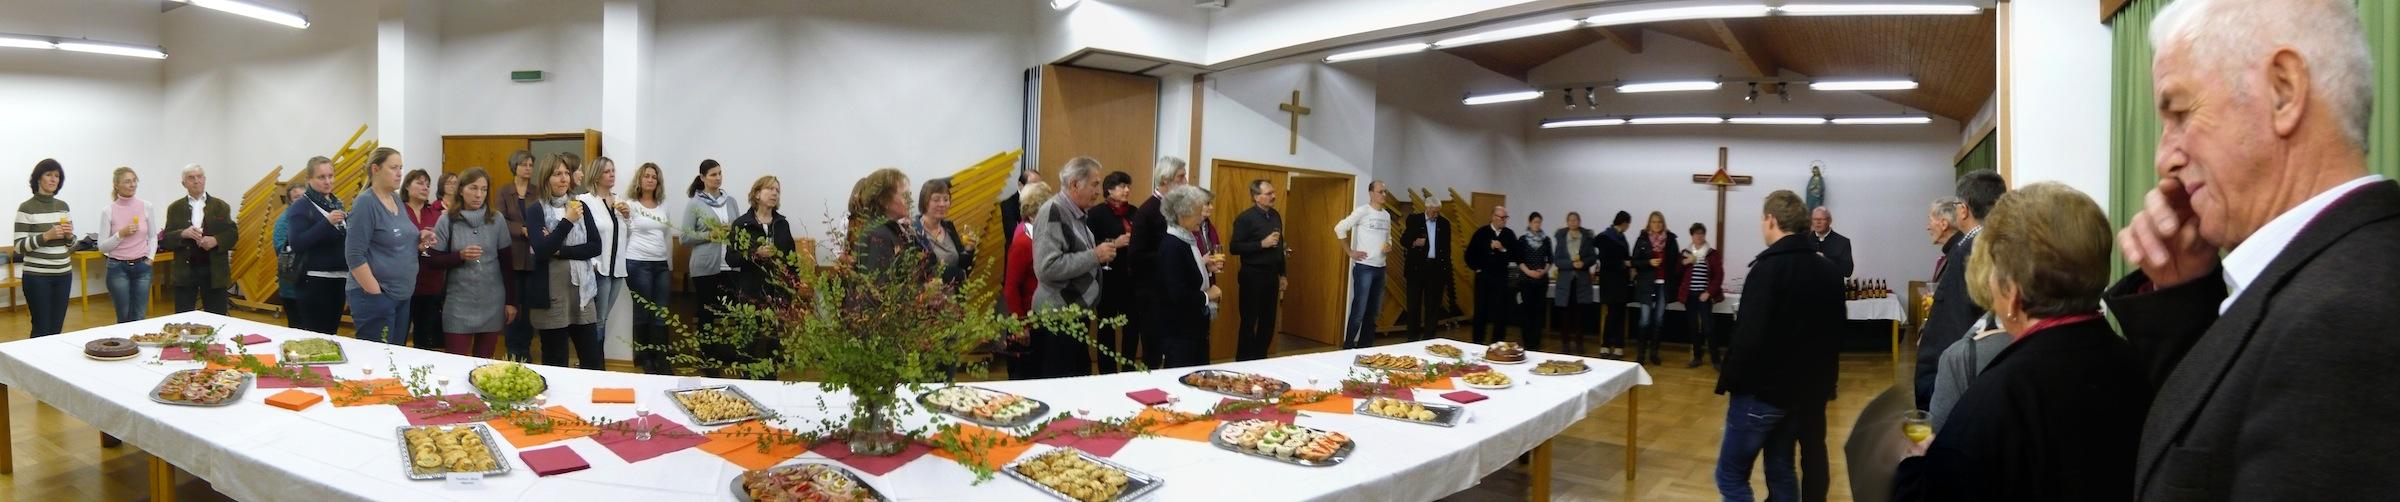 Cäcilienfeier 2014 im Pfarrheim Prutting